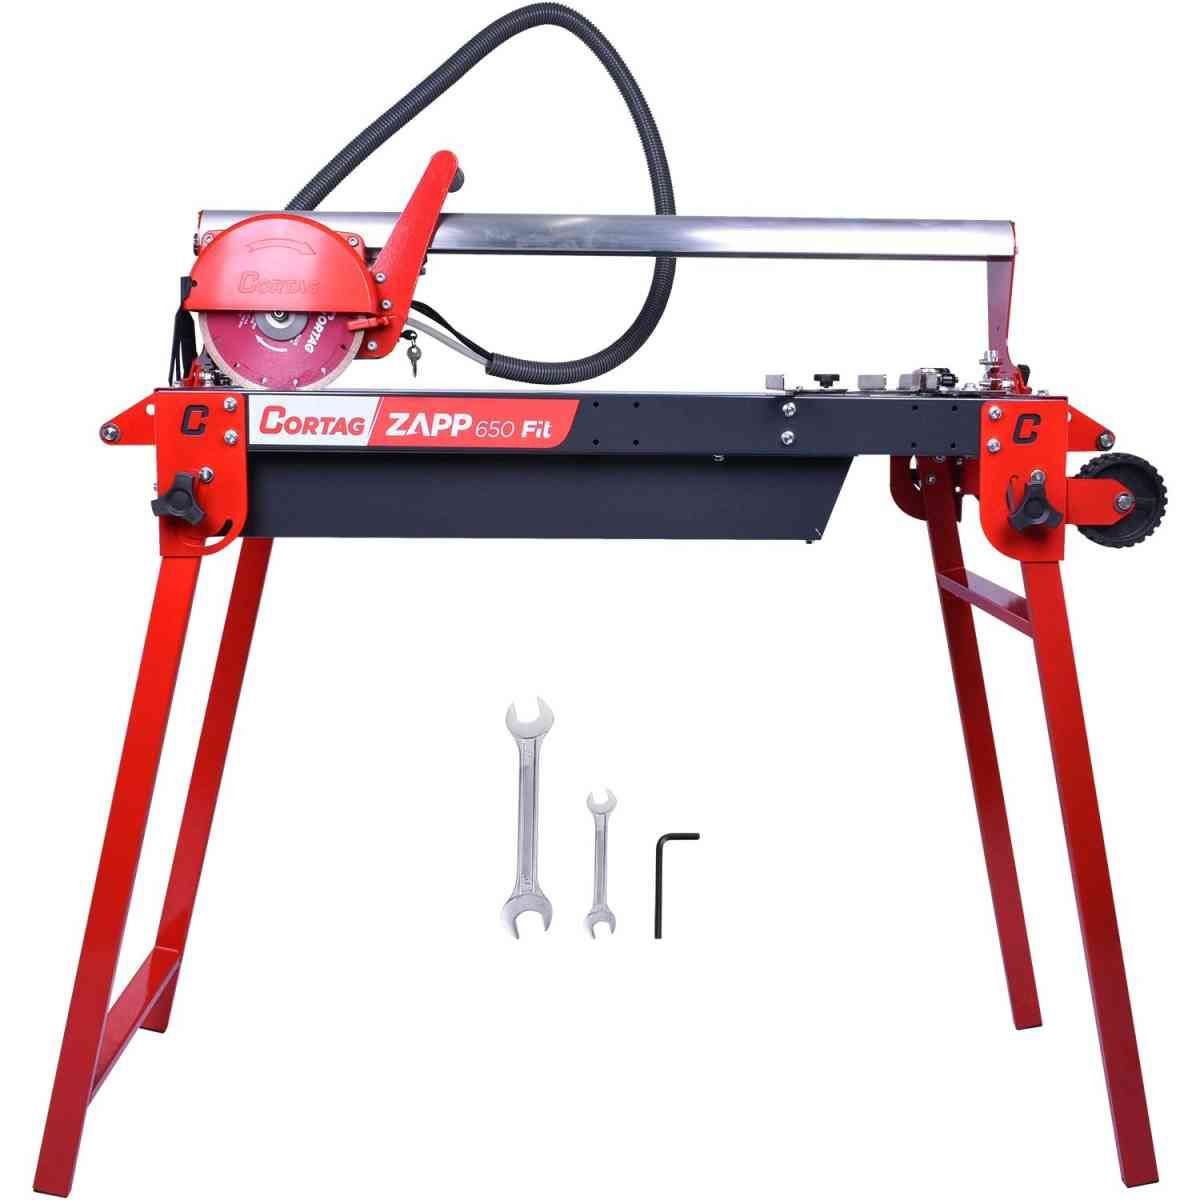 Cortador Pisos Profissional  Eletrico 650cm Zapp 650 FIT 220V Cortag